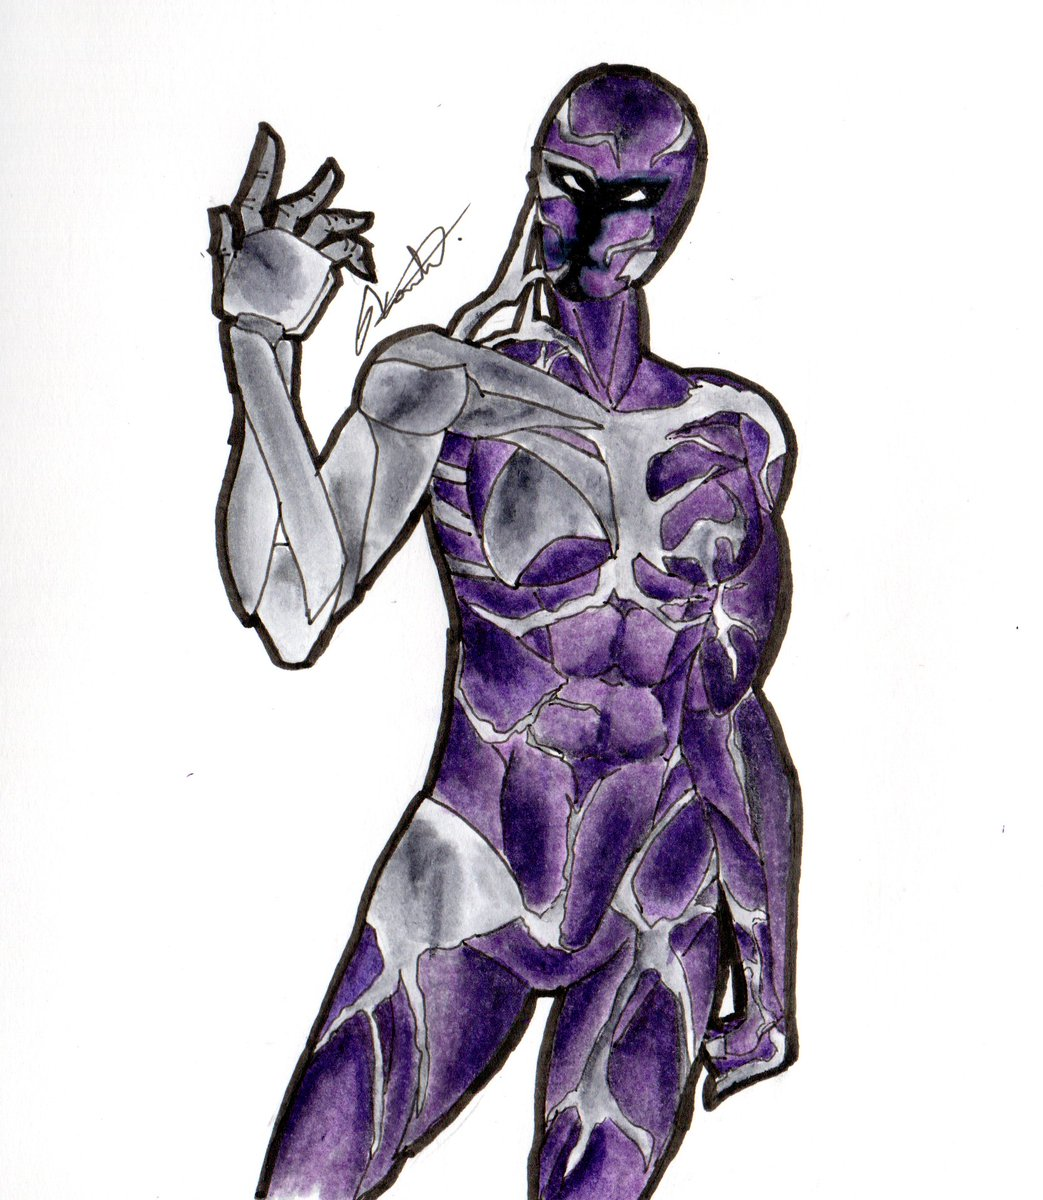 Scorn! What happened to her? #symbiotemarathon #symbiote #spiderman #marvel #alien #drawingoftheday #drawing #draweveryday #dailyart #daily #dailydrawing #traditionalart #traditionalpainting #traditionalartist #traditional_artpic.twitter.com/Tnjo97hIUZ